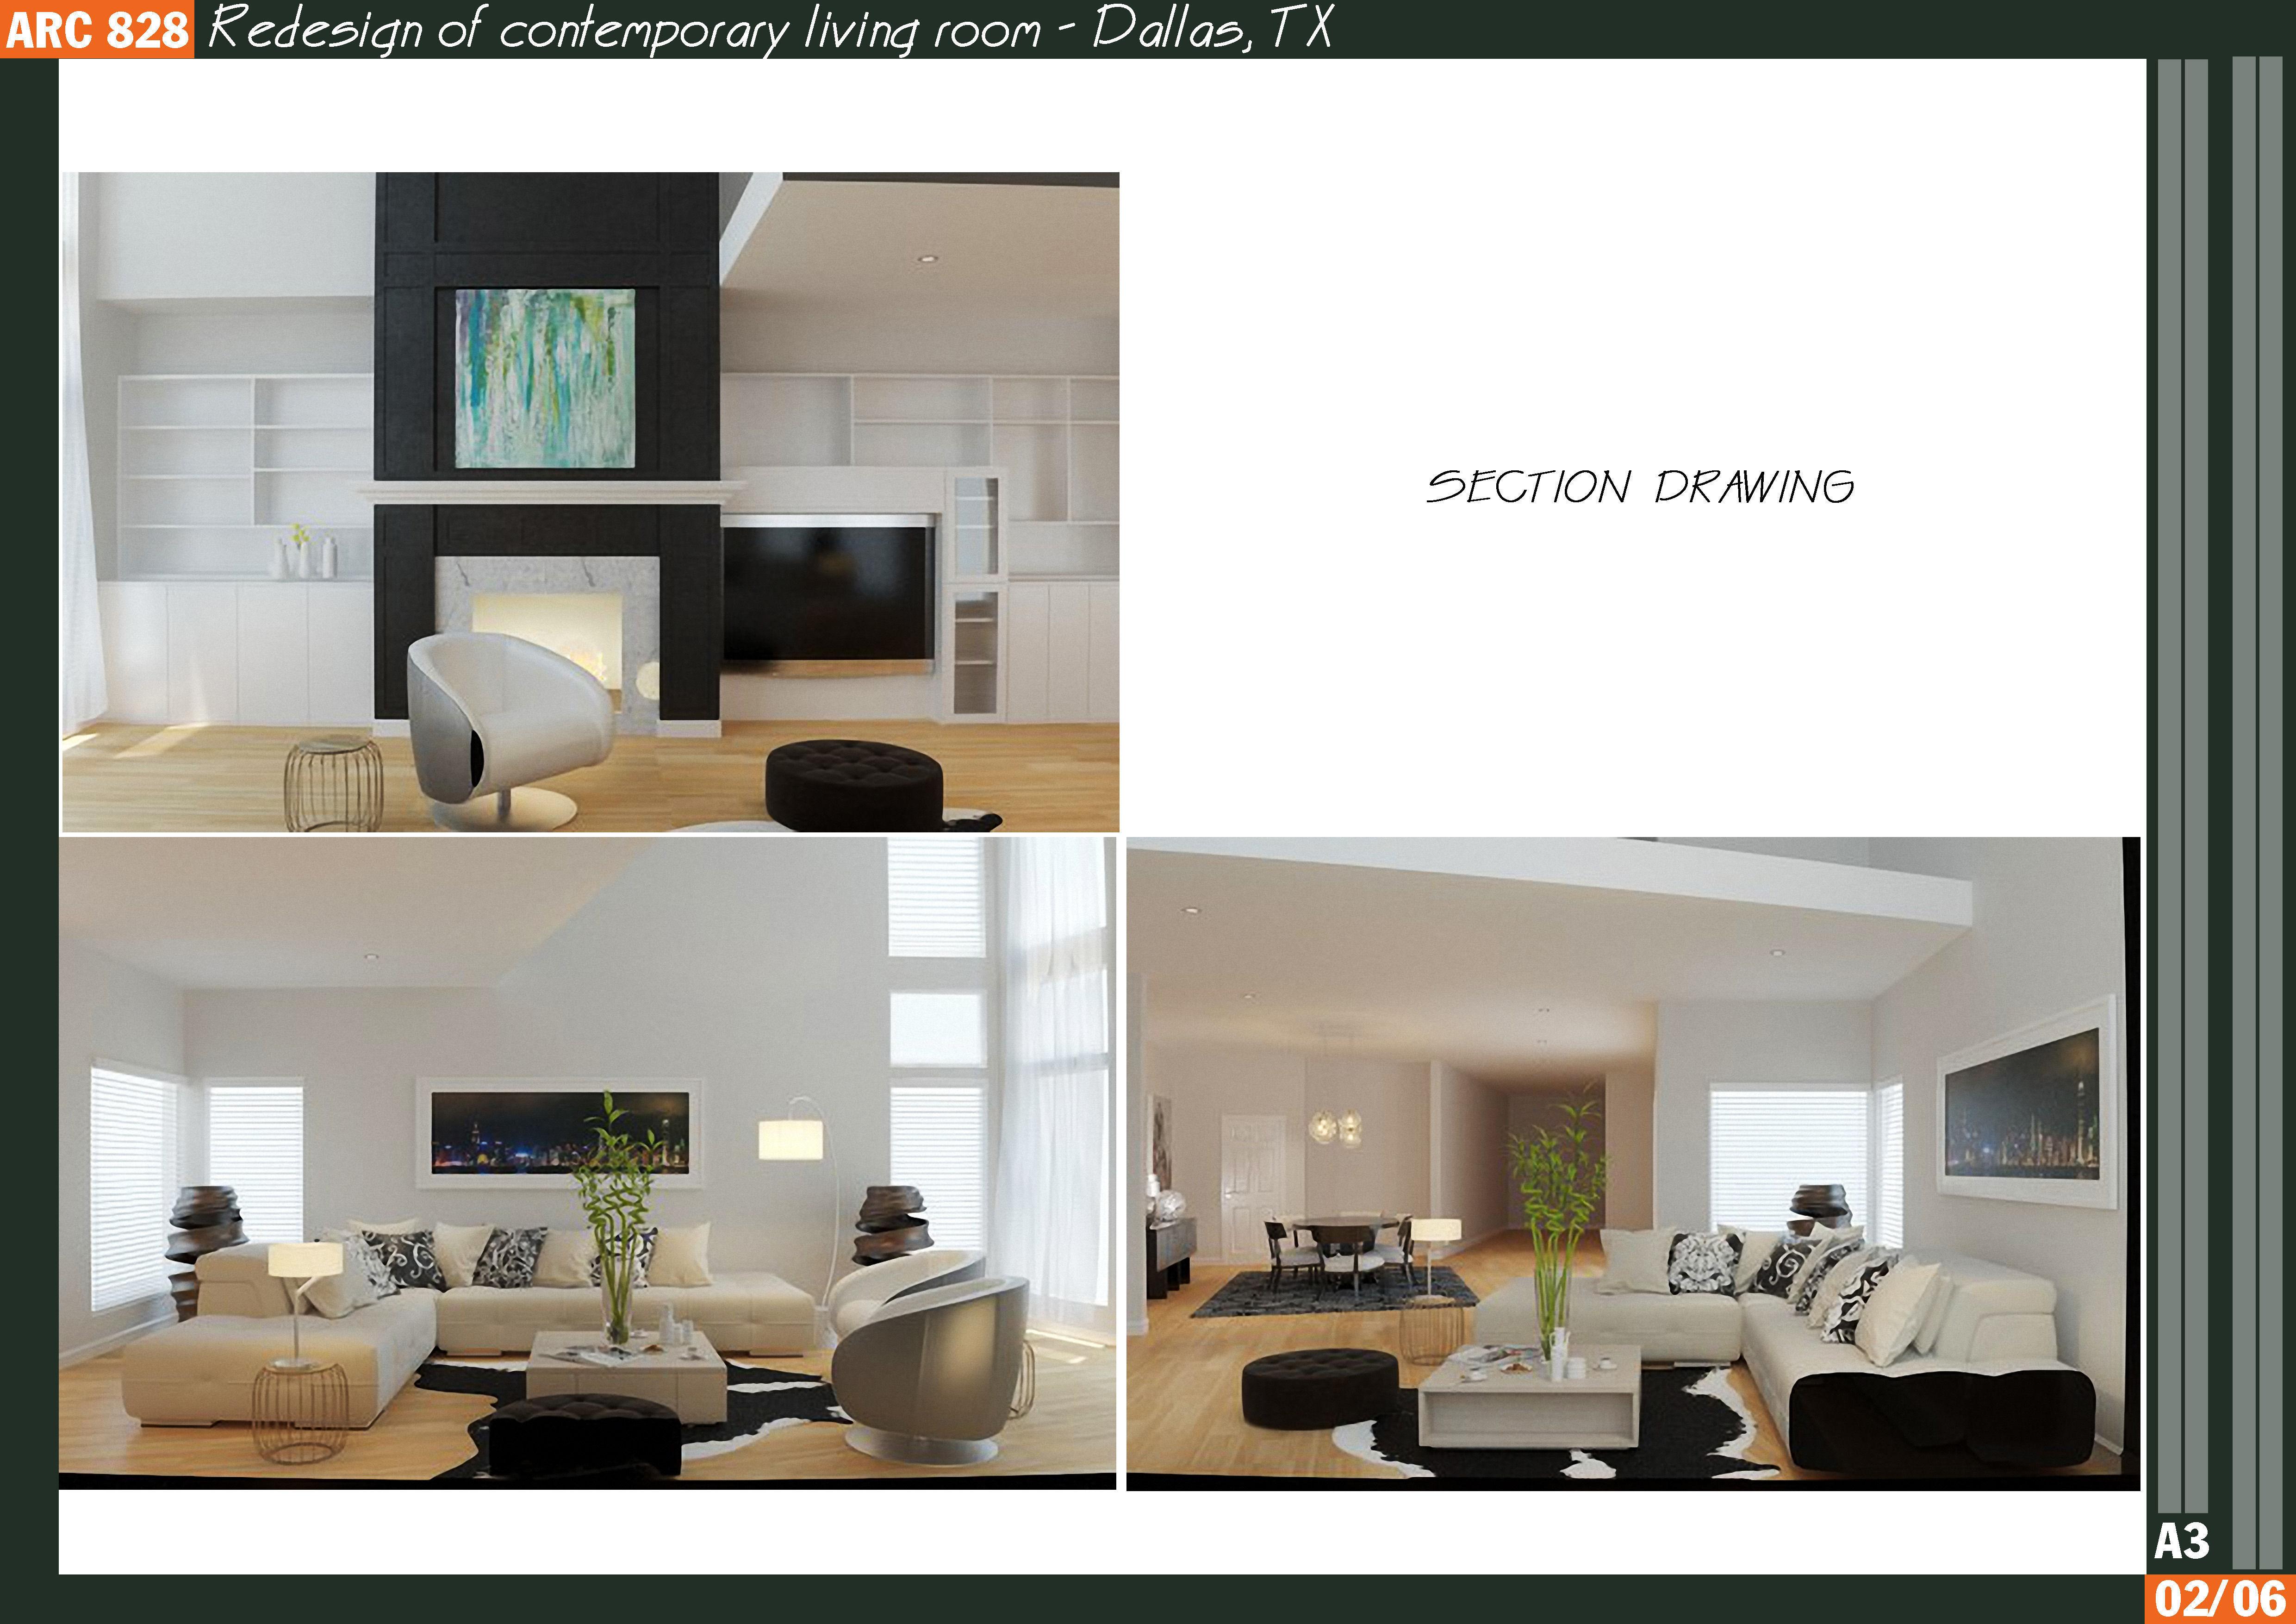 13 - Redesign of contemporary living room - Dallas 3D model MAX